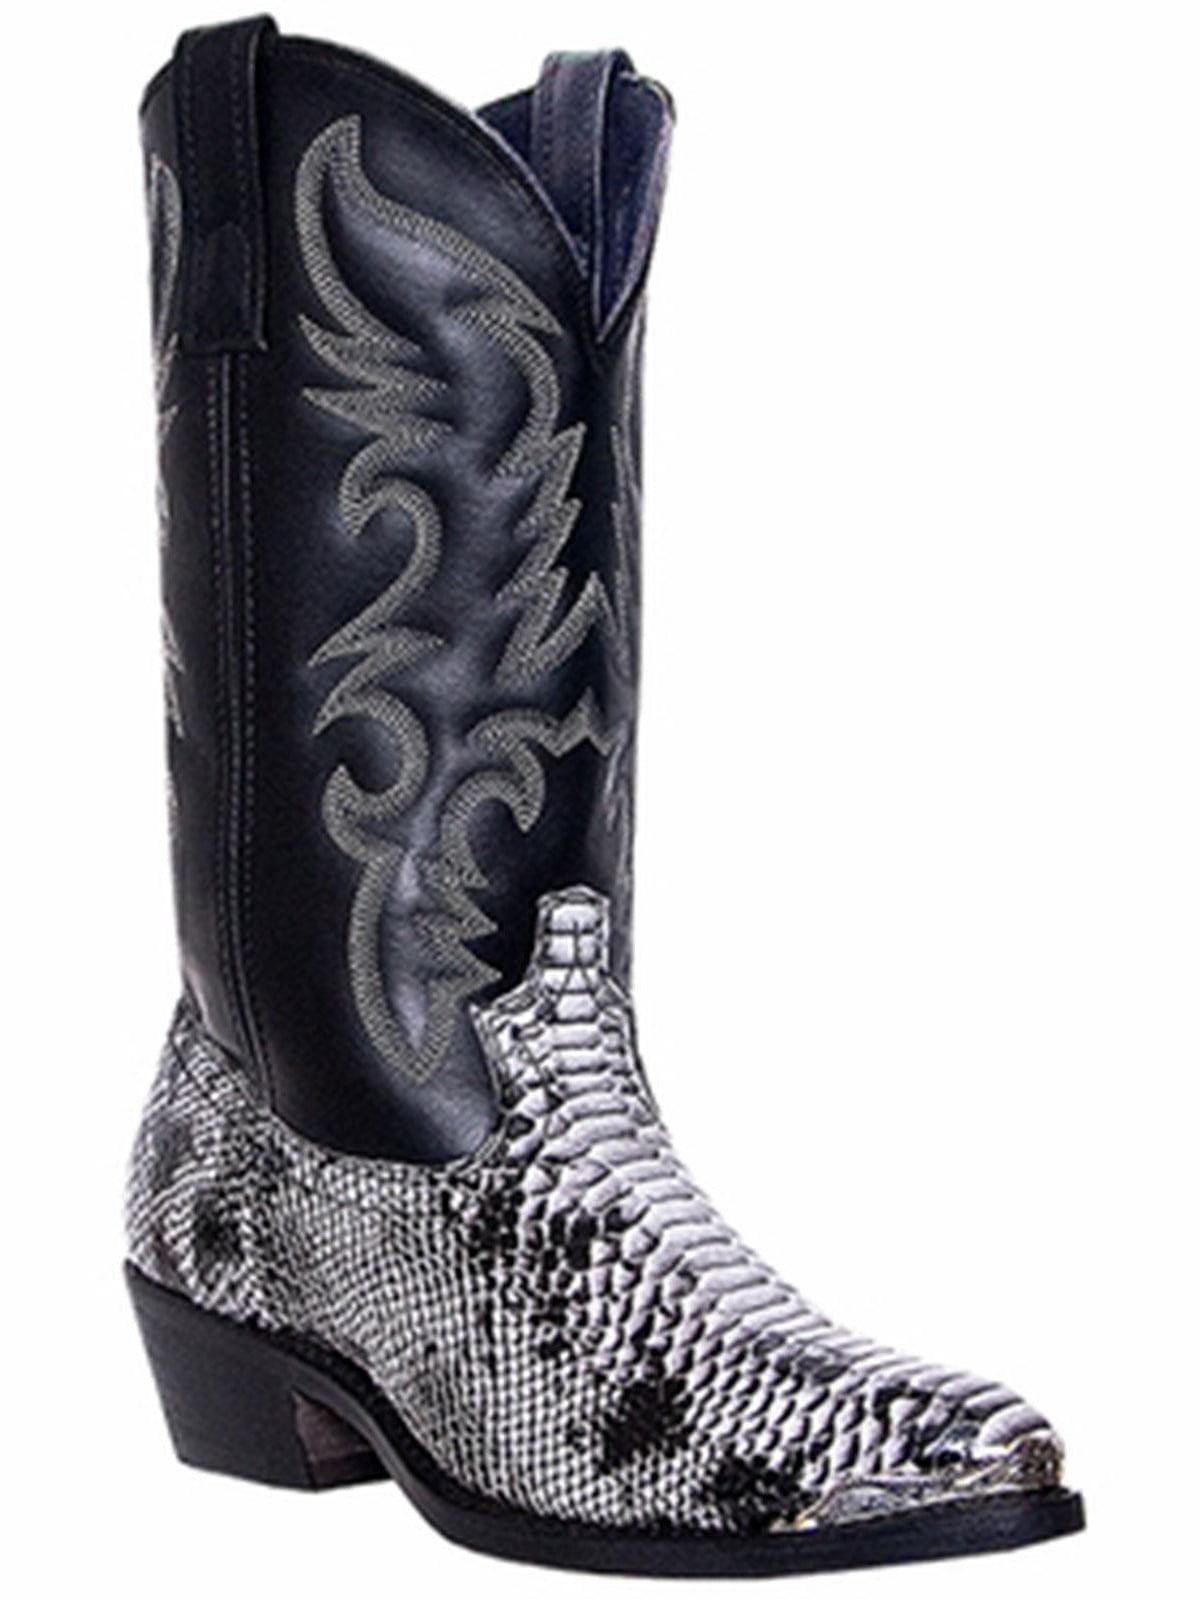 Laredo 68067 Men's Black and White Snake Print Monty Western Boots by Laredo